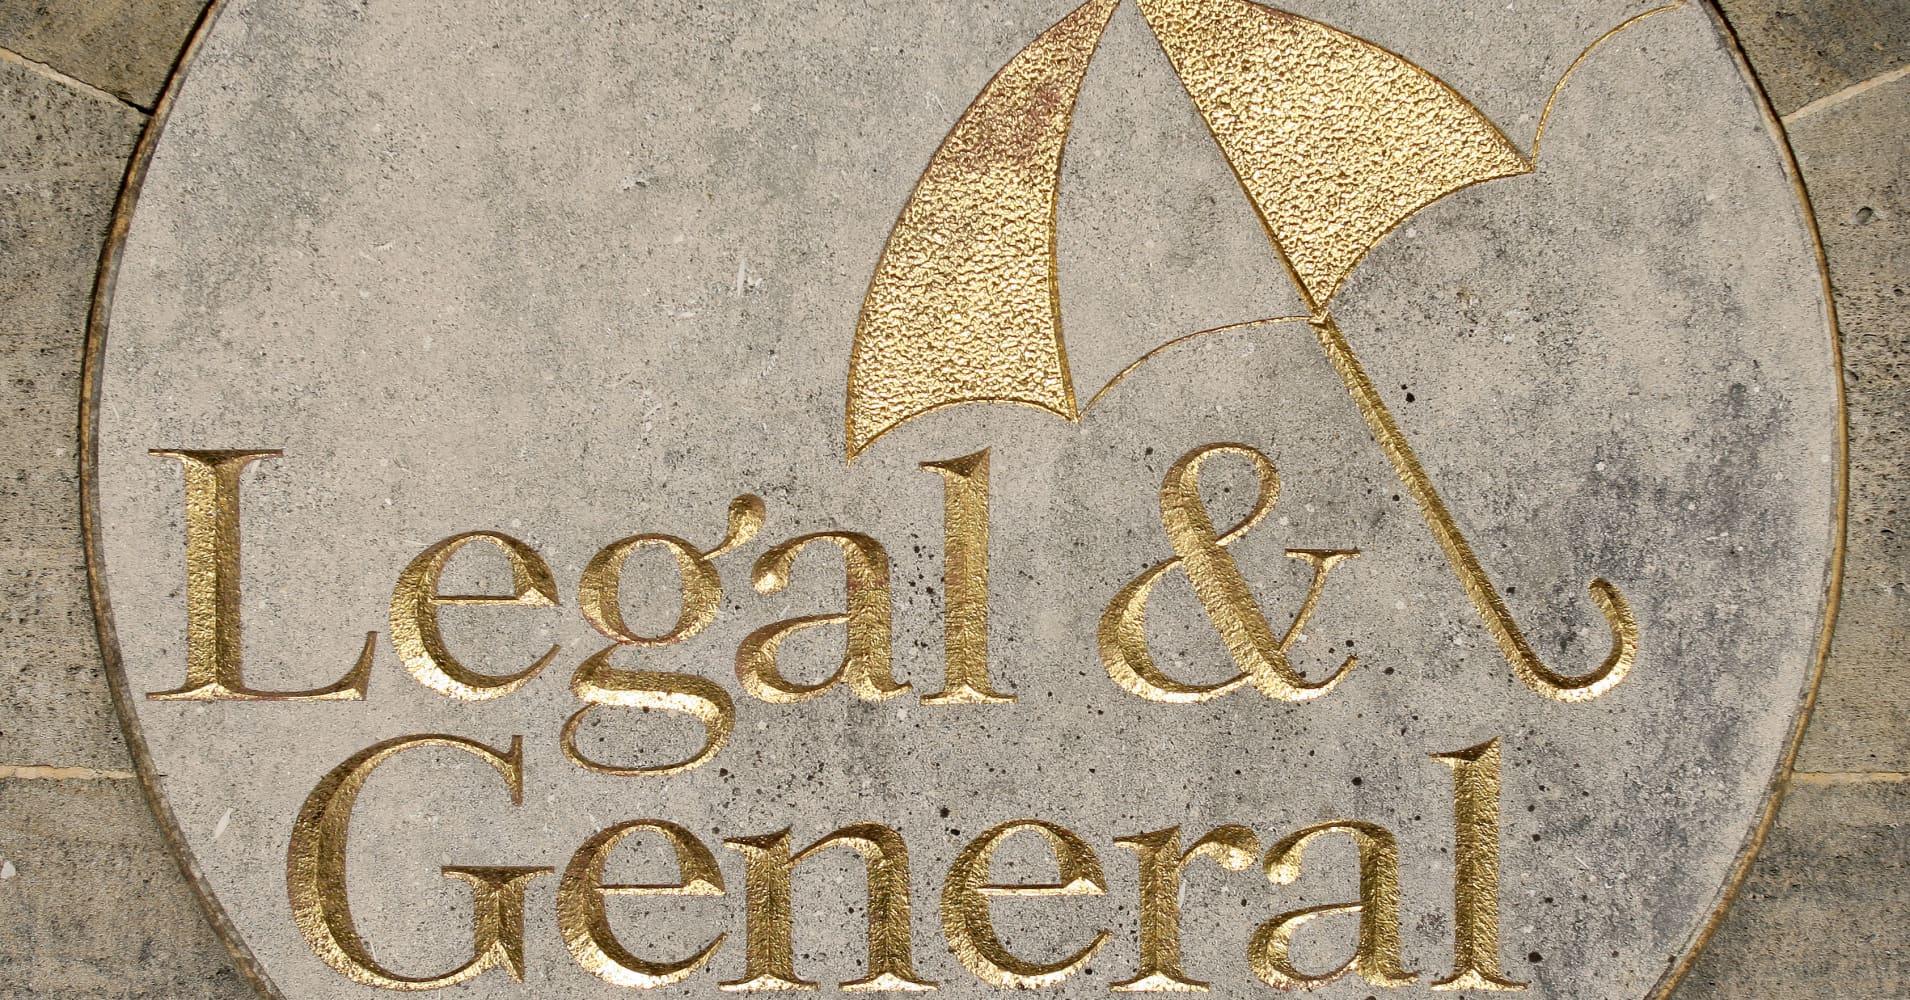 Legal & General 2018 operating profit rises 10%